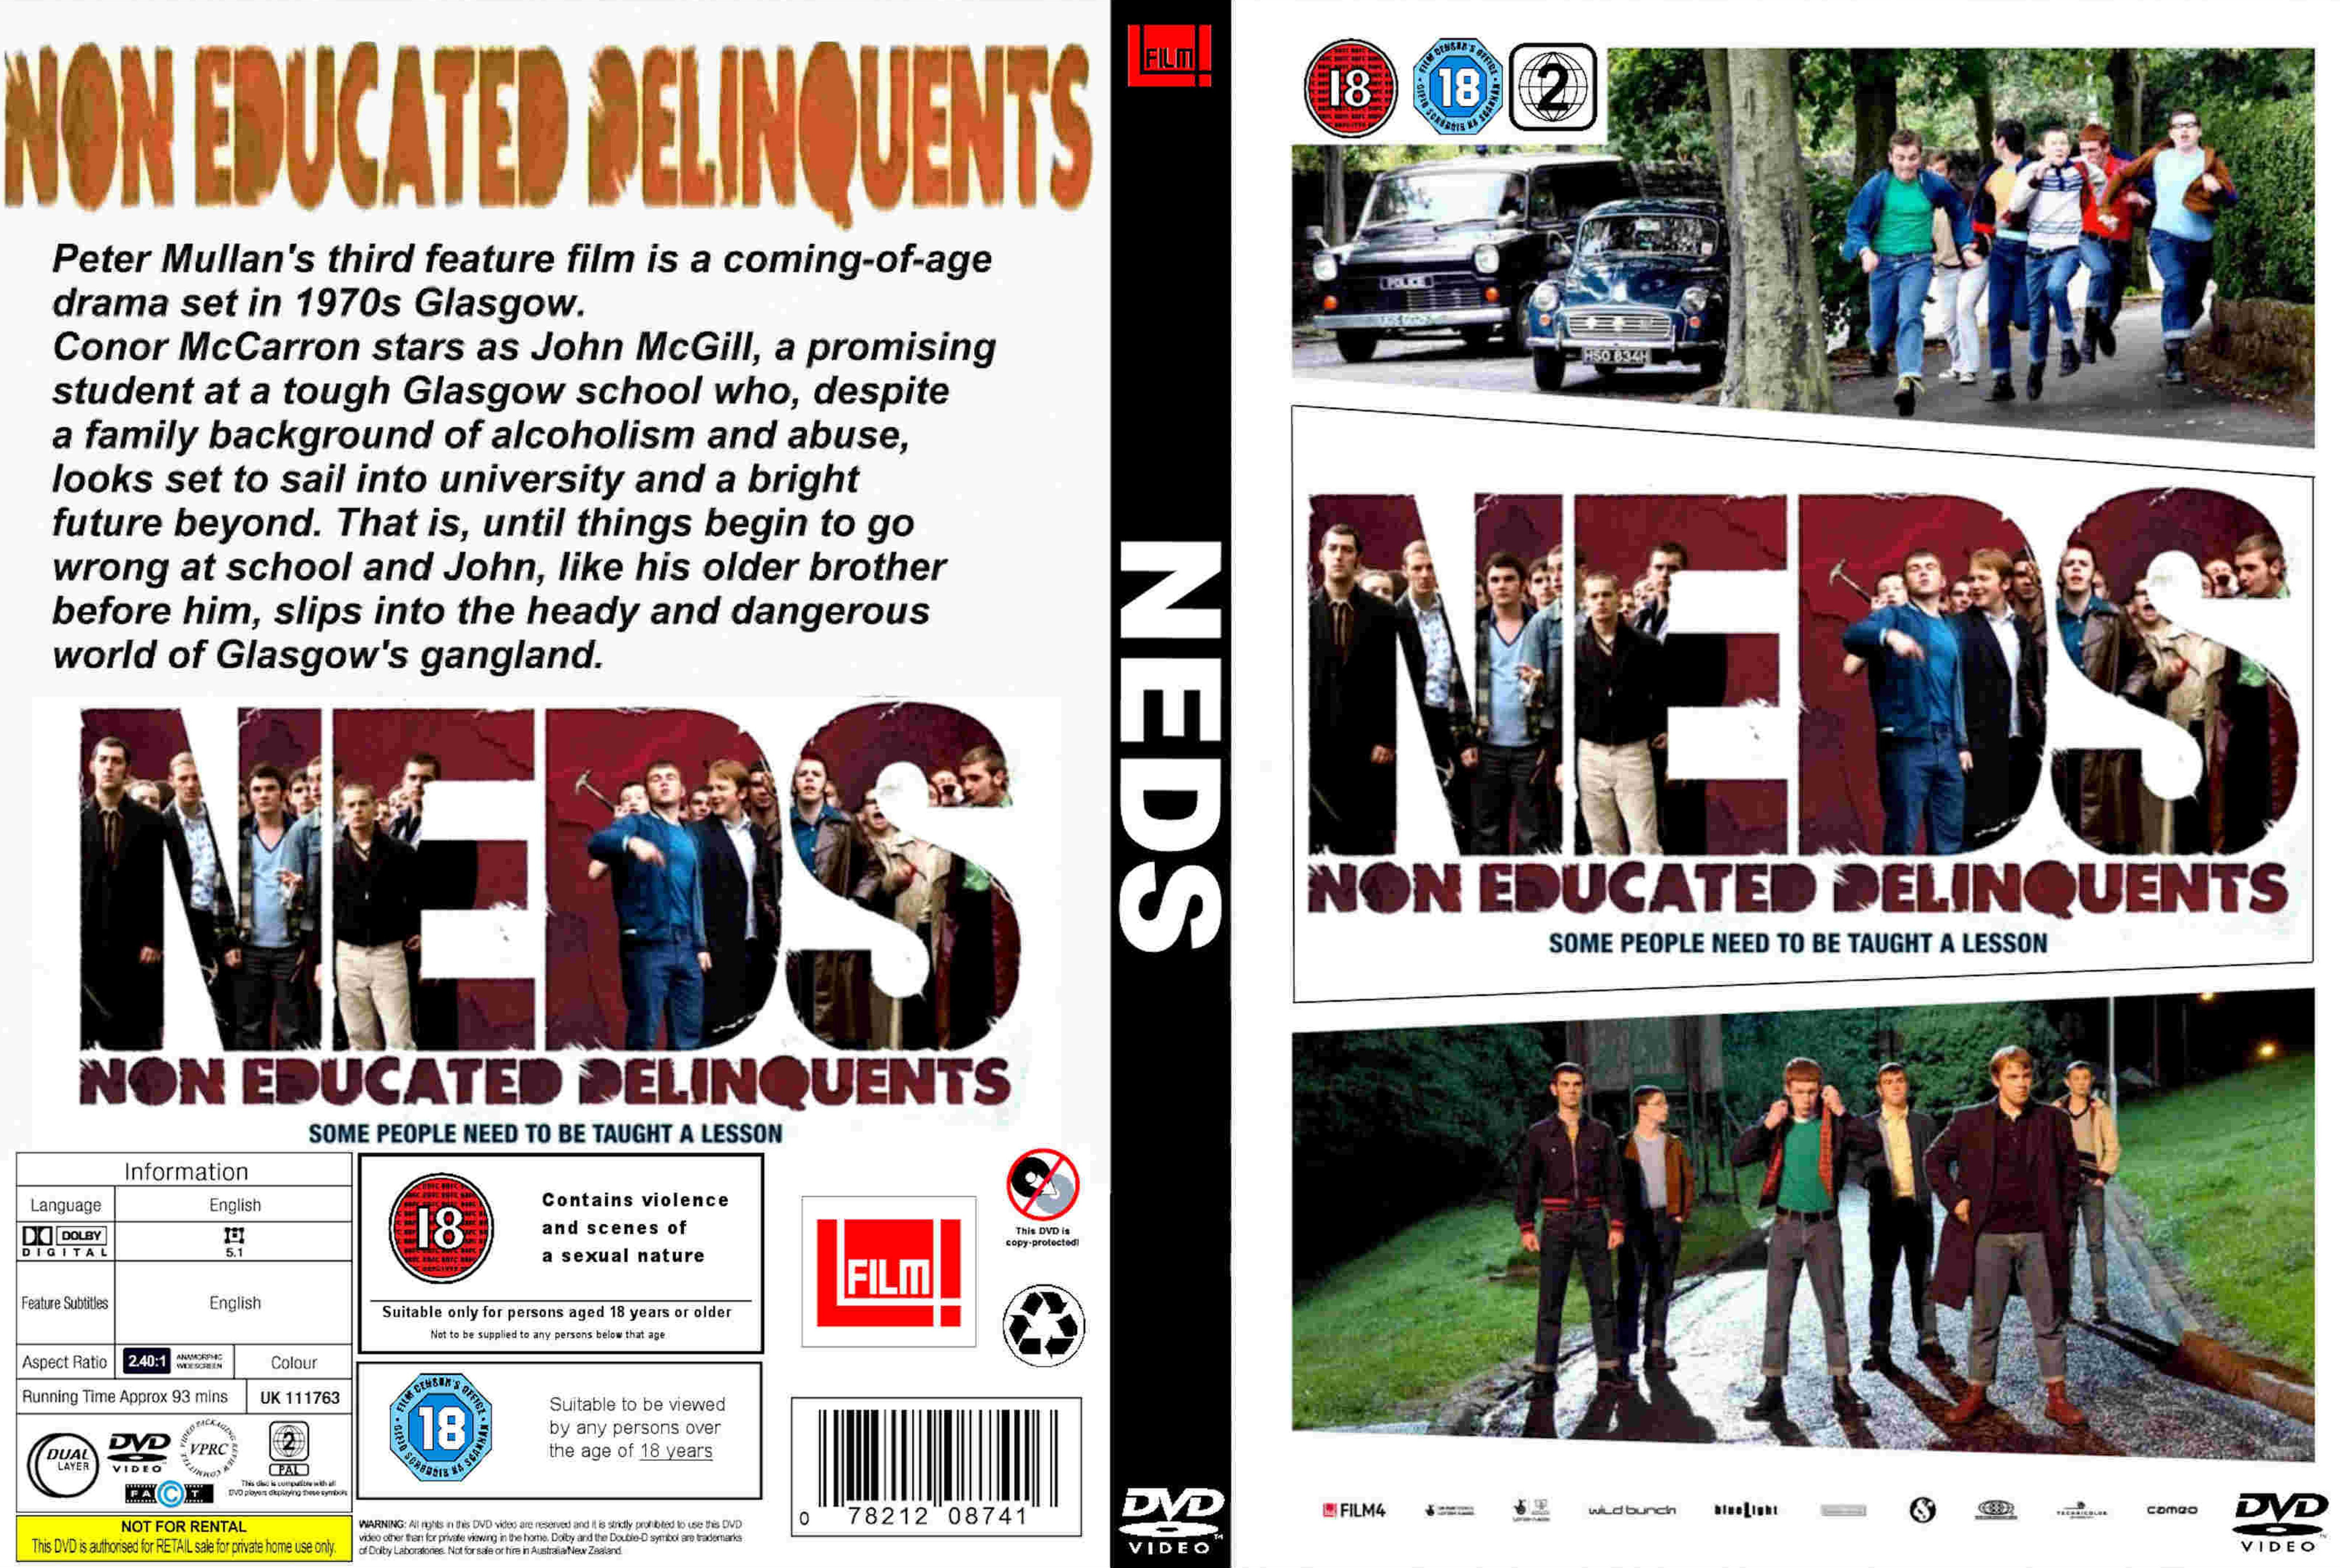 TaH7KkI Neds Jovens Delinquentes Torrent   BluRay Rip 1080p Dublado 5.1 (2014)